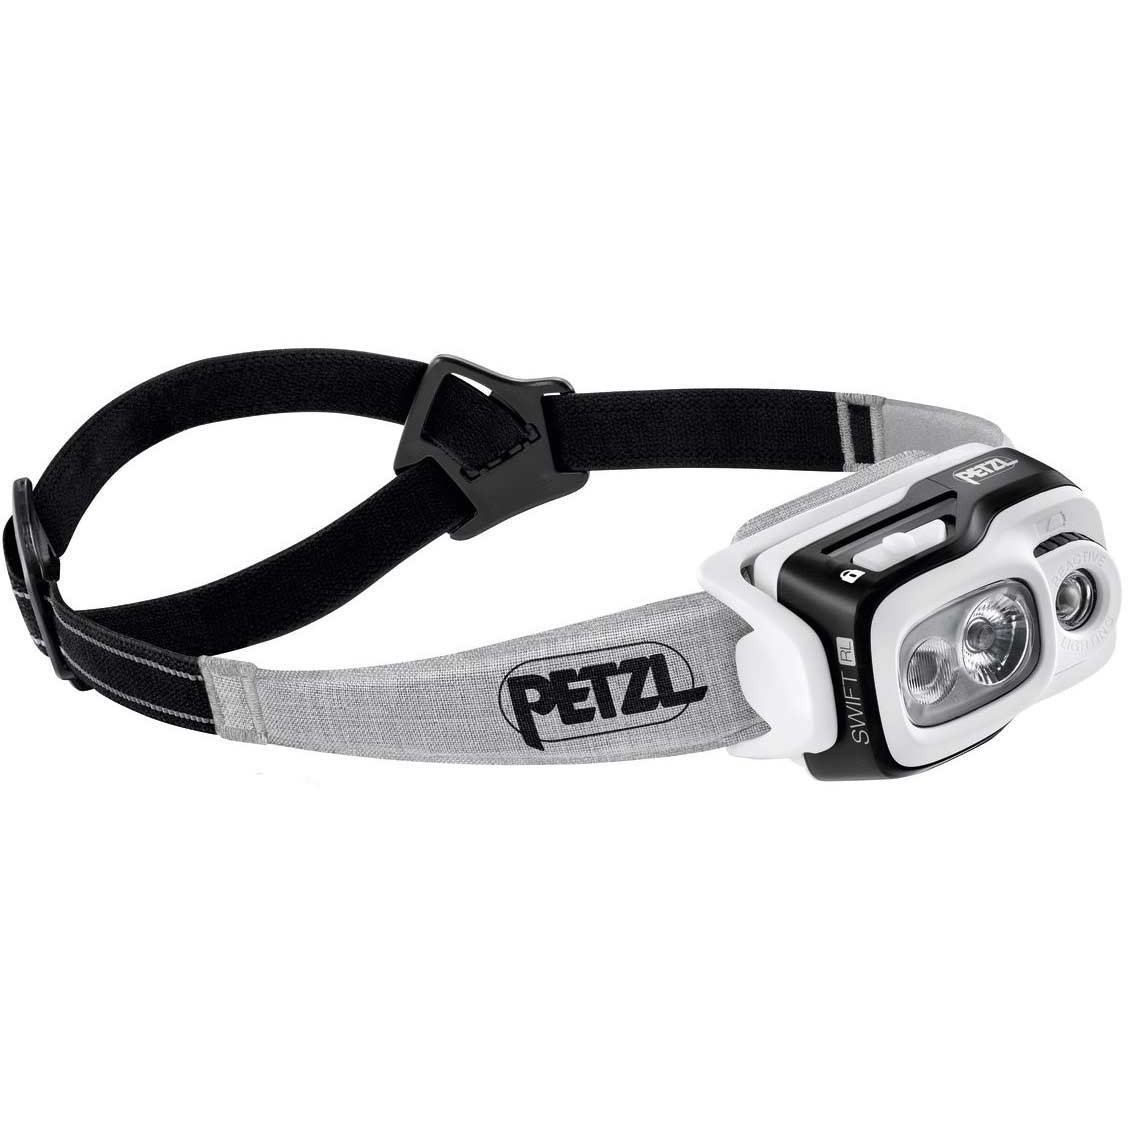 Petzl Swift RL Rechargeable Headtorch - Black